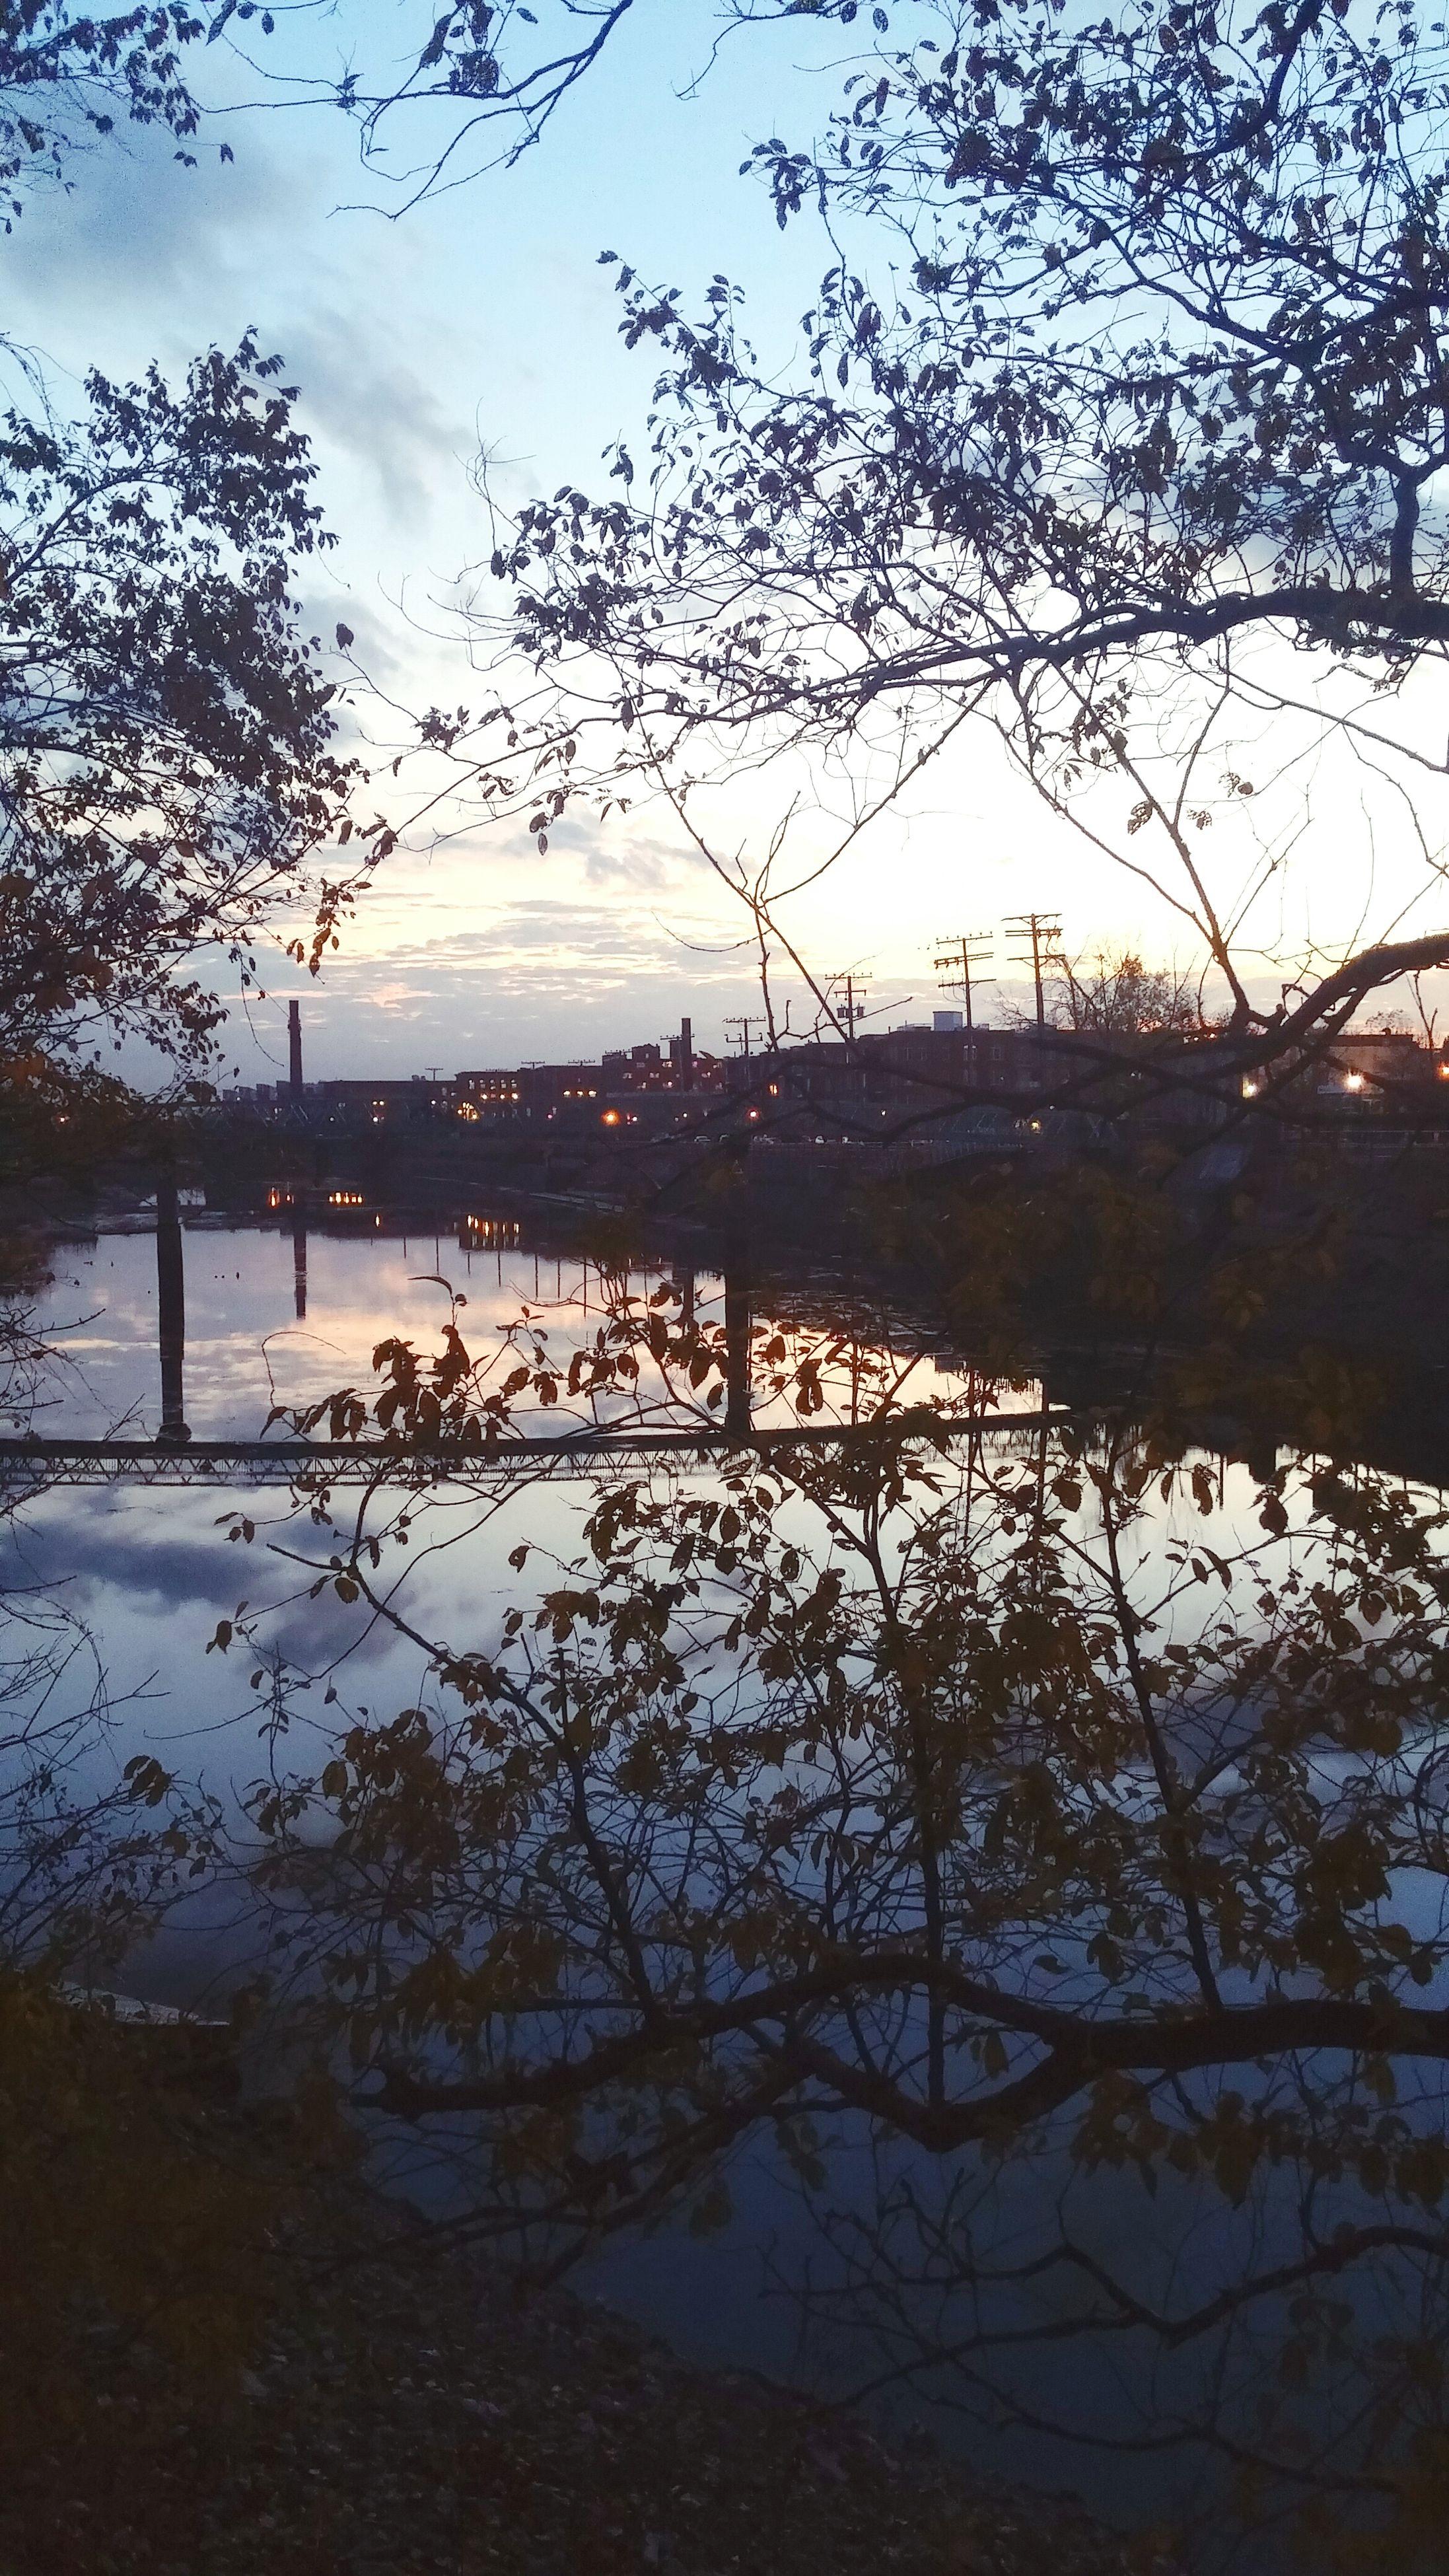 water, tranquility, tranquil scene, scenics, sky, tree, beauty in nature, nature, lake, branch, sunset, silhouette, reflection, bare tree, idyllic, sea, lakeshore, non-urban scene, river, calm